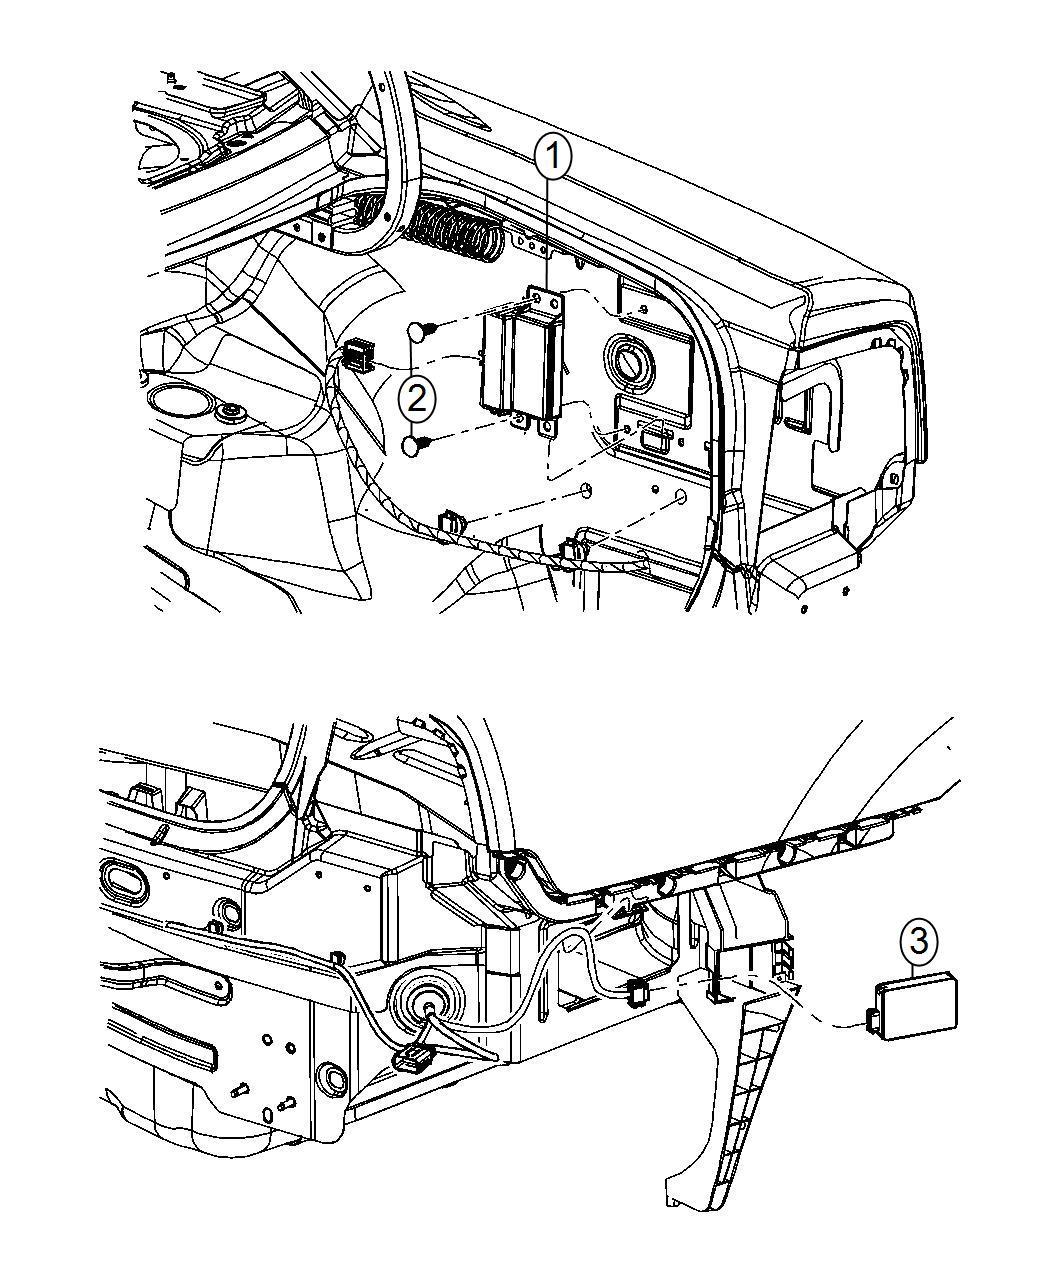 2014 Chrysler 300 Module. Blind spot detection. Path